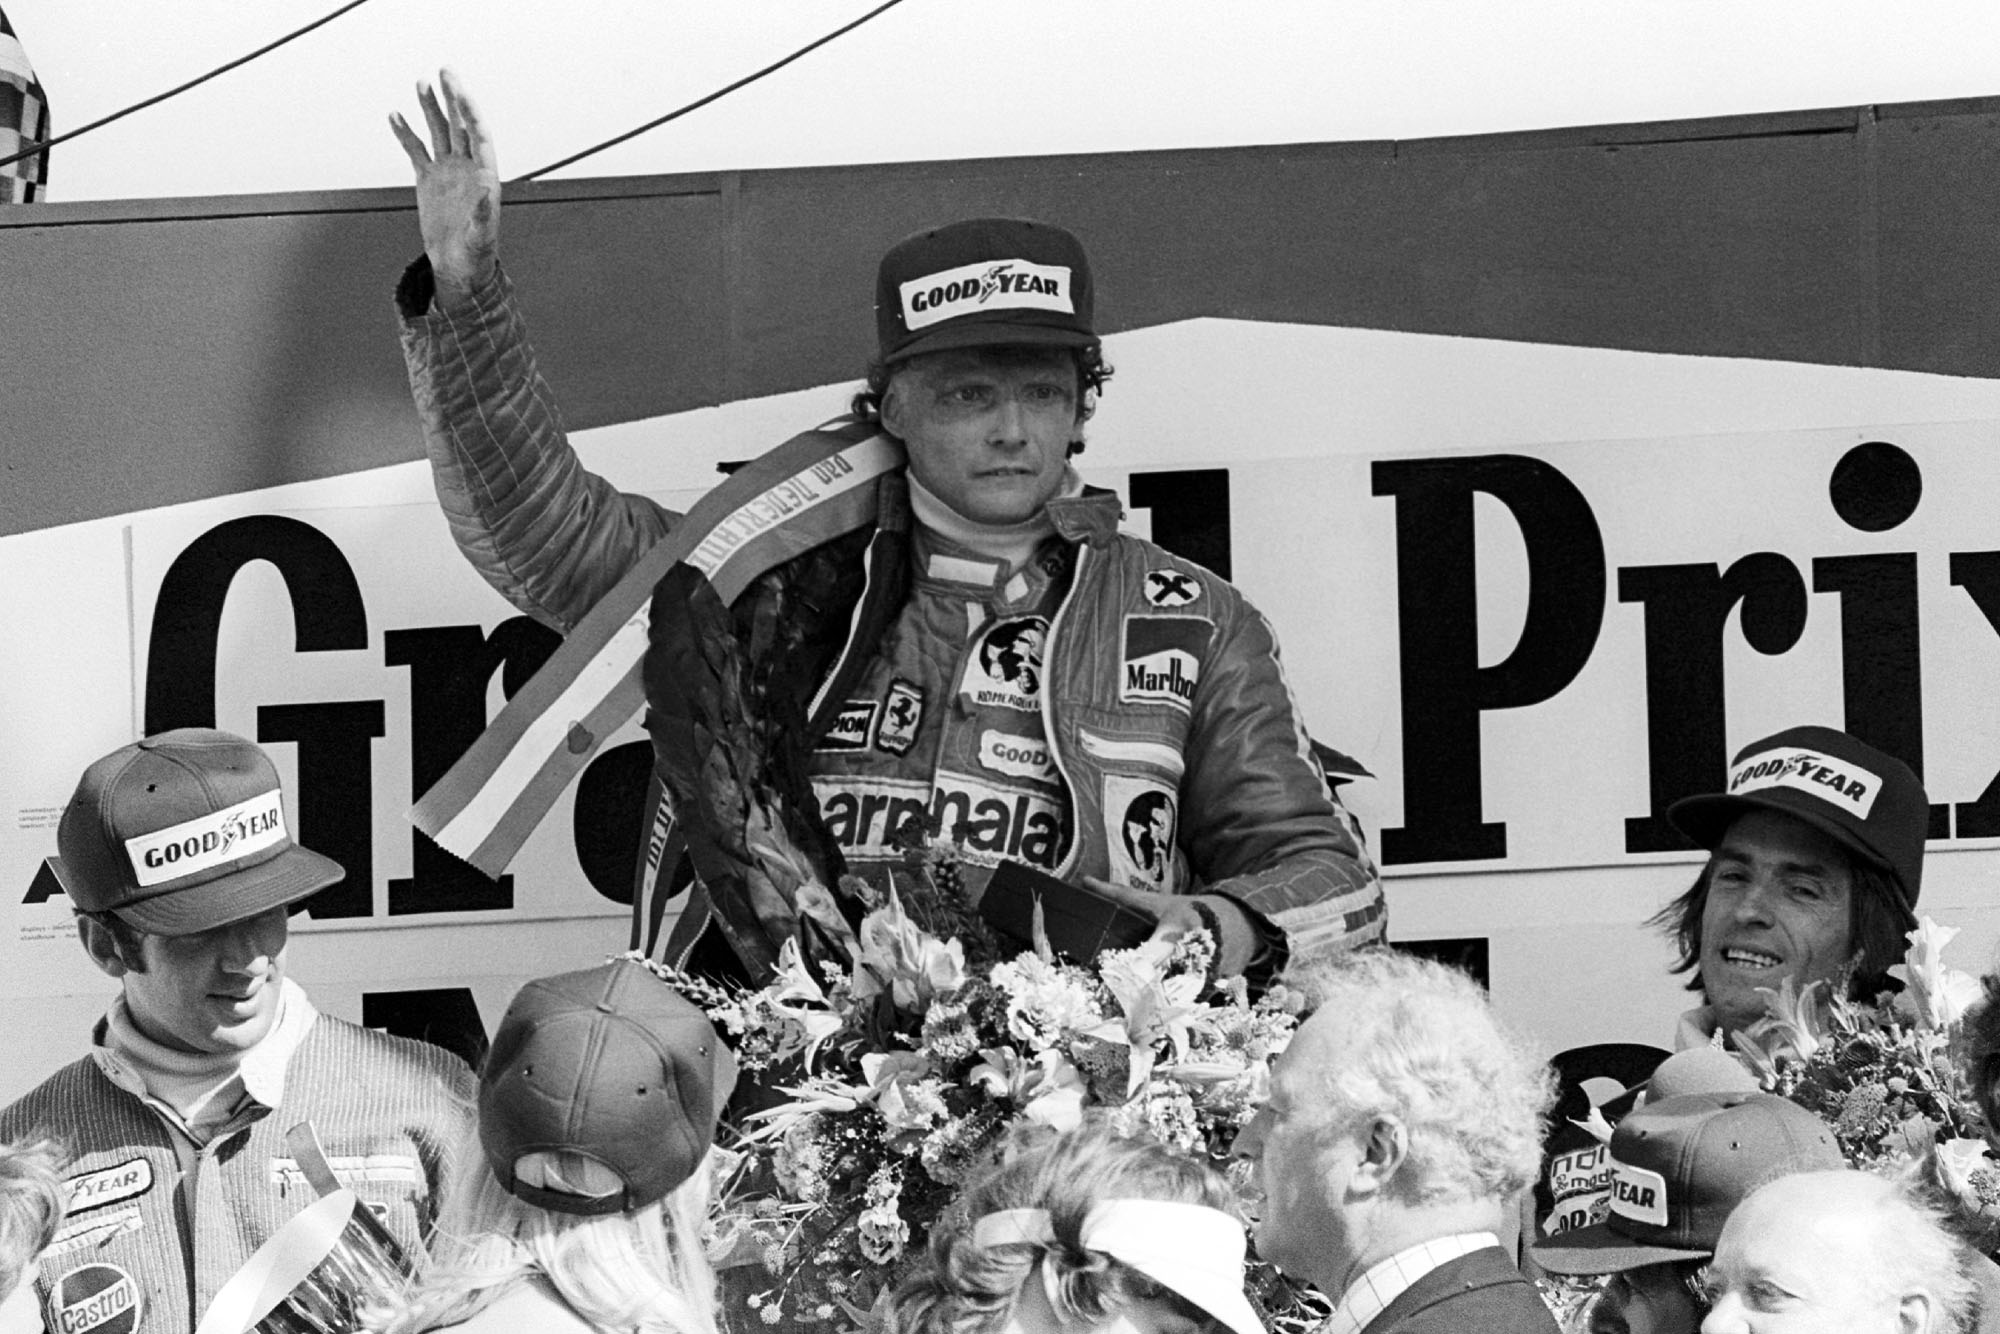 Niki Lauda celebrates winning the 1977 Dutch Grand Prix, Zandvoort.